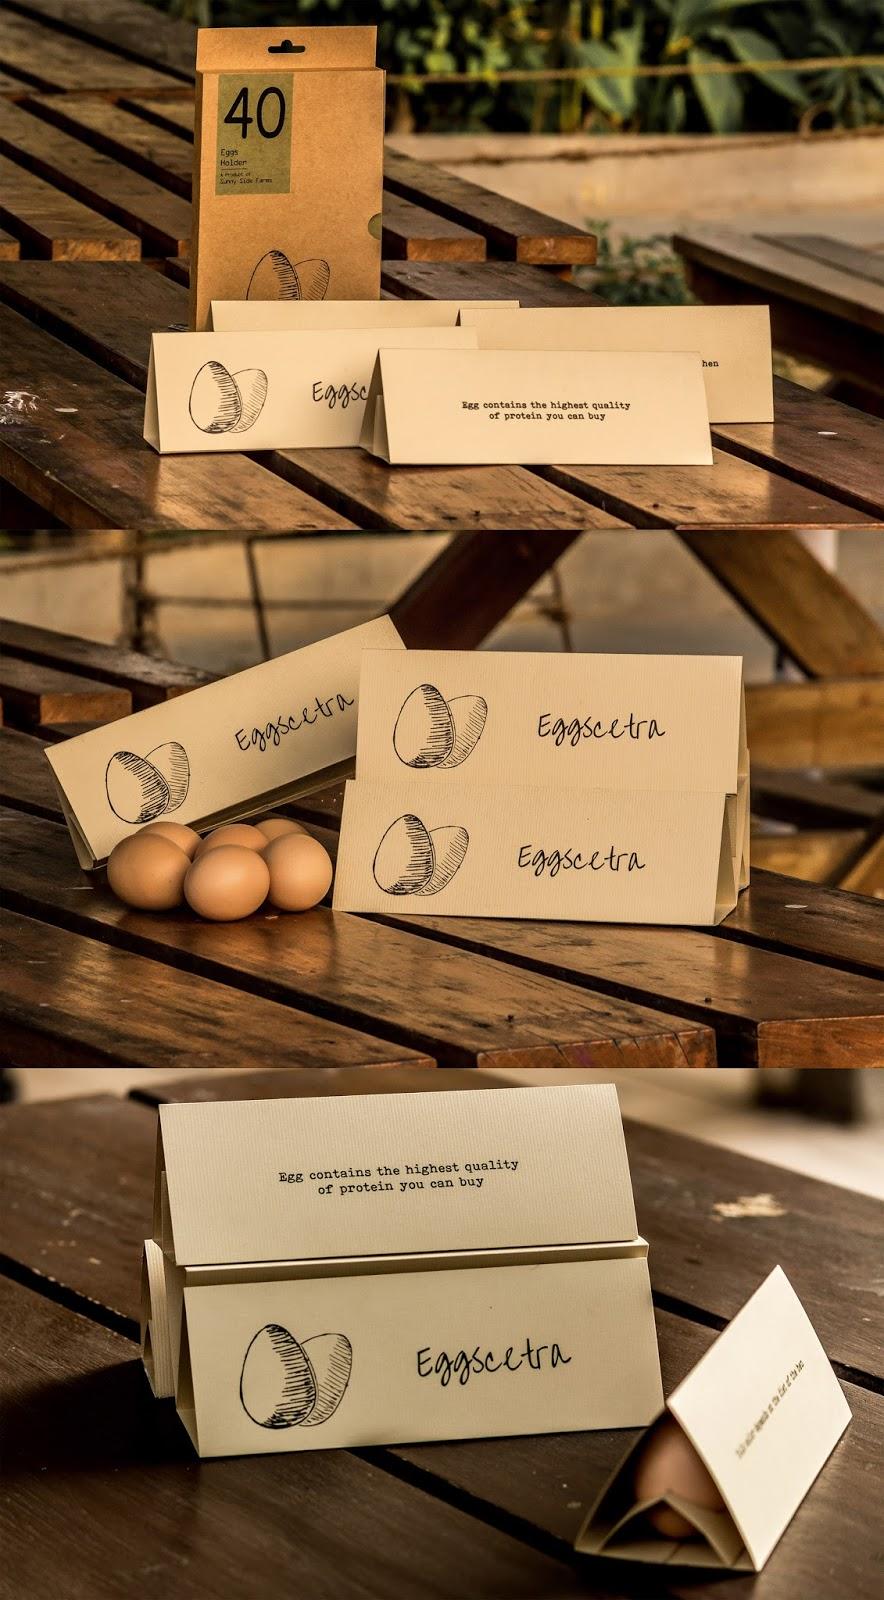 Eggscetra 蛋品创意包装2